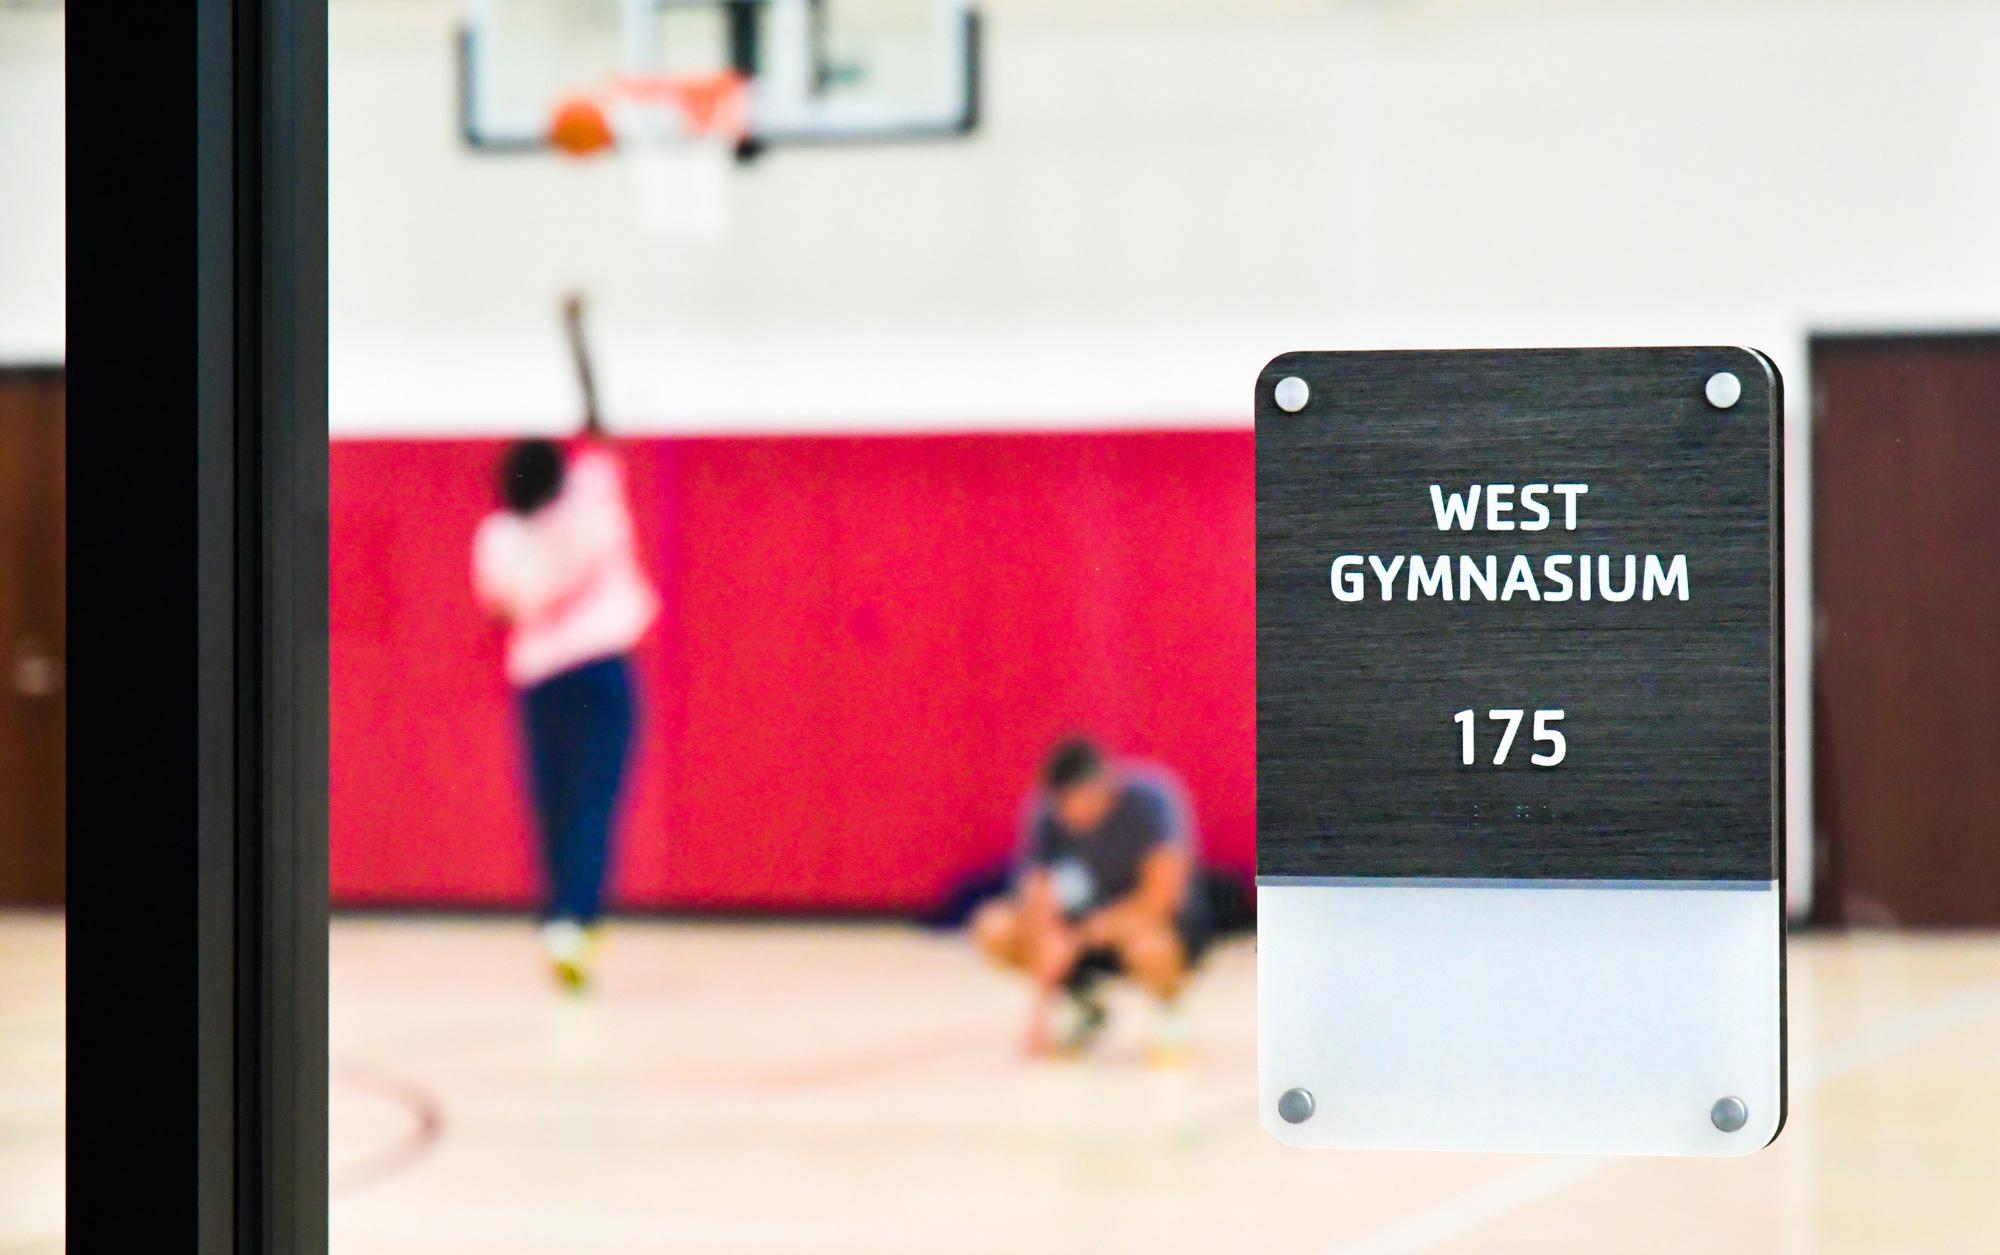 Fusion gymnasium sign at YMCA